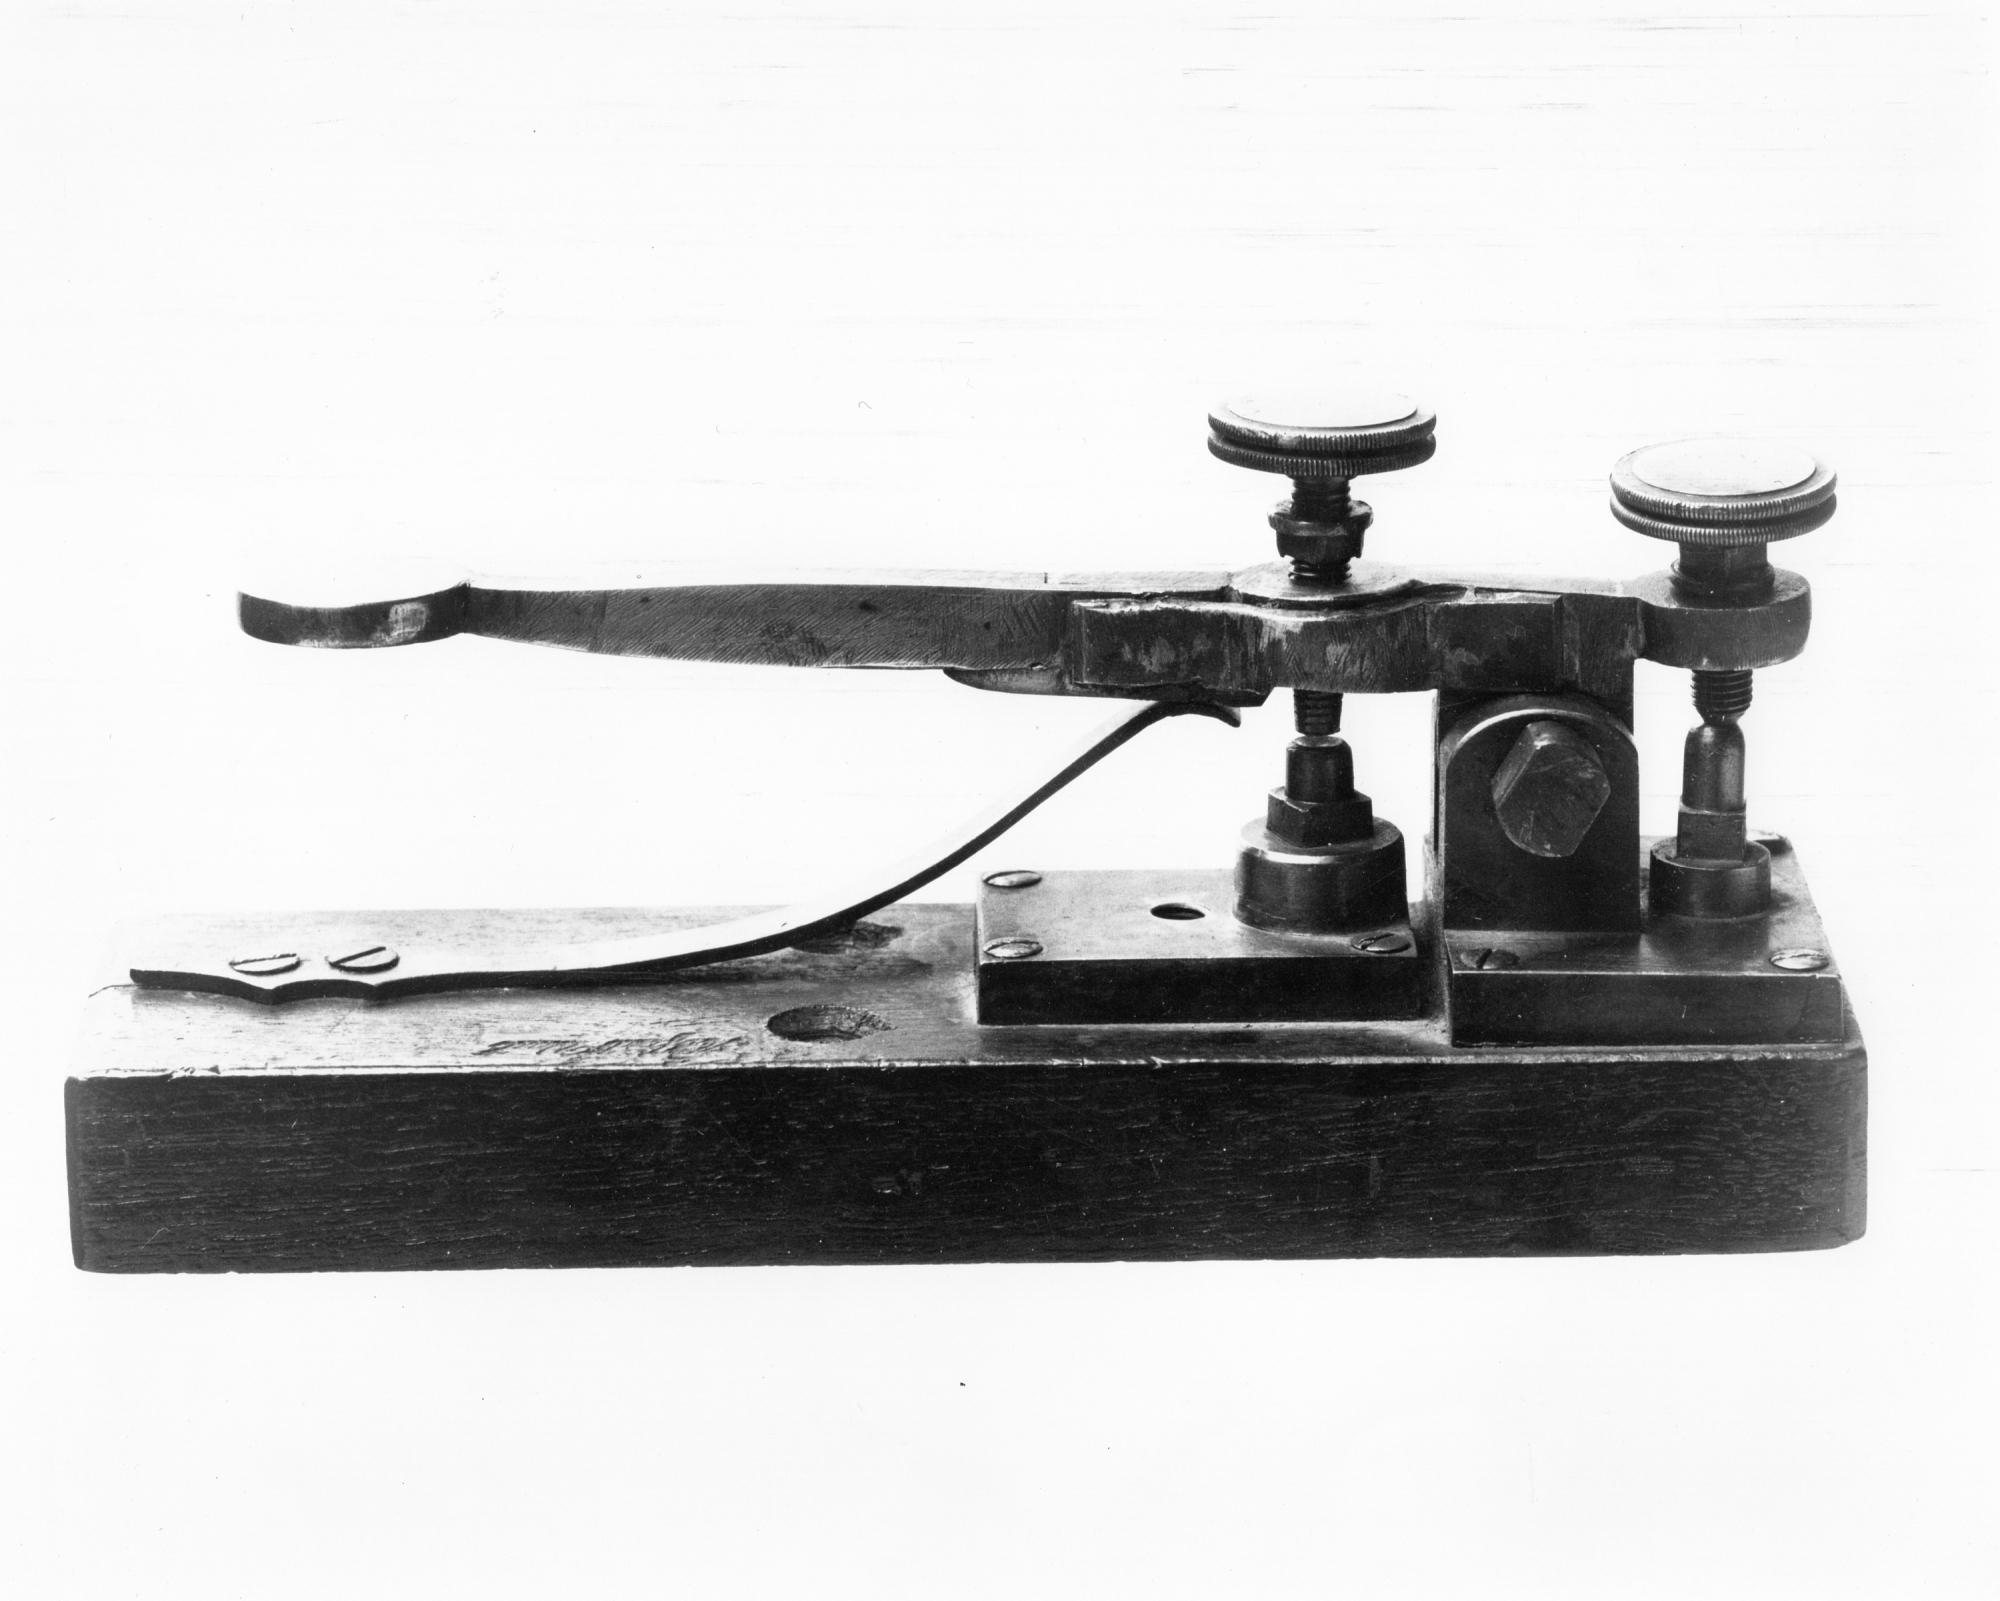 Morse-Vail Telegraph Key